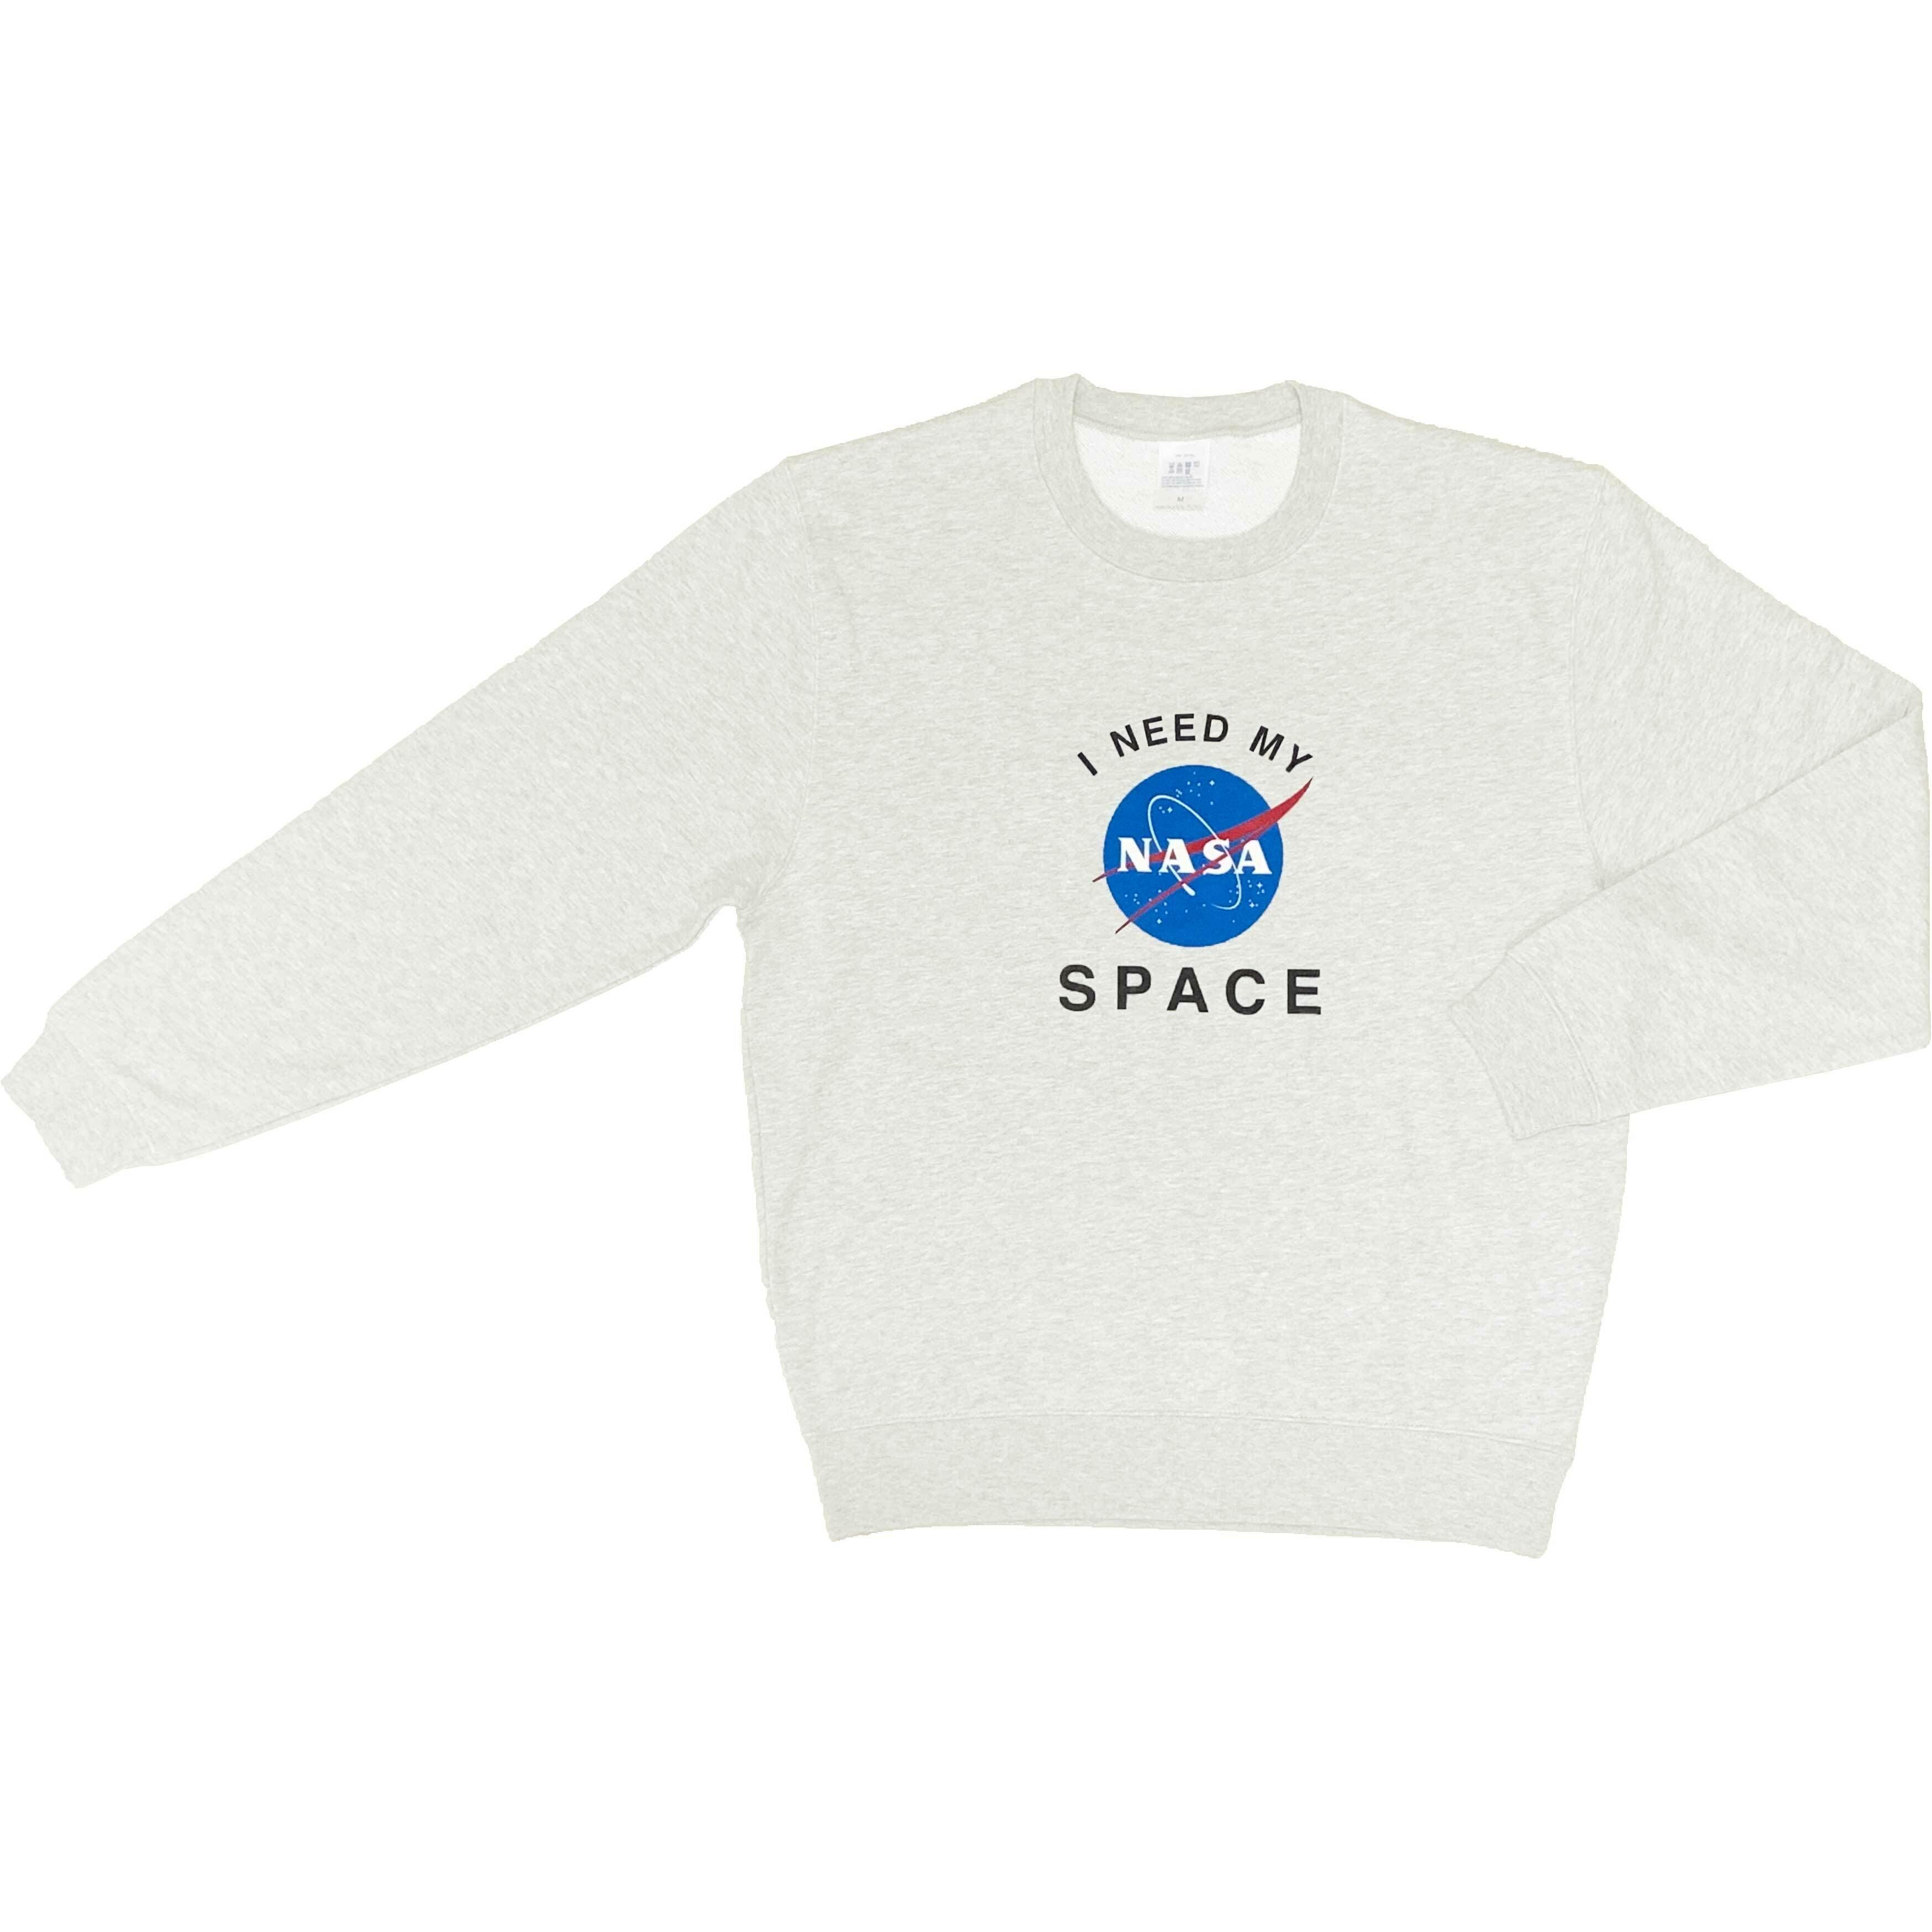 NASA公認(アメリカ航空宇宙局)・トレーナー・JERZEES(ジャージーズ)ボディ・インサイニア(ミートボール)・ホワイト